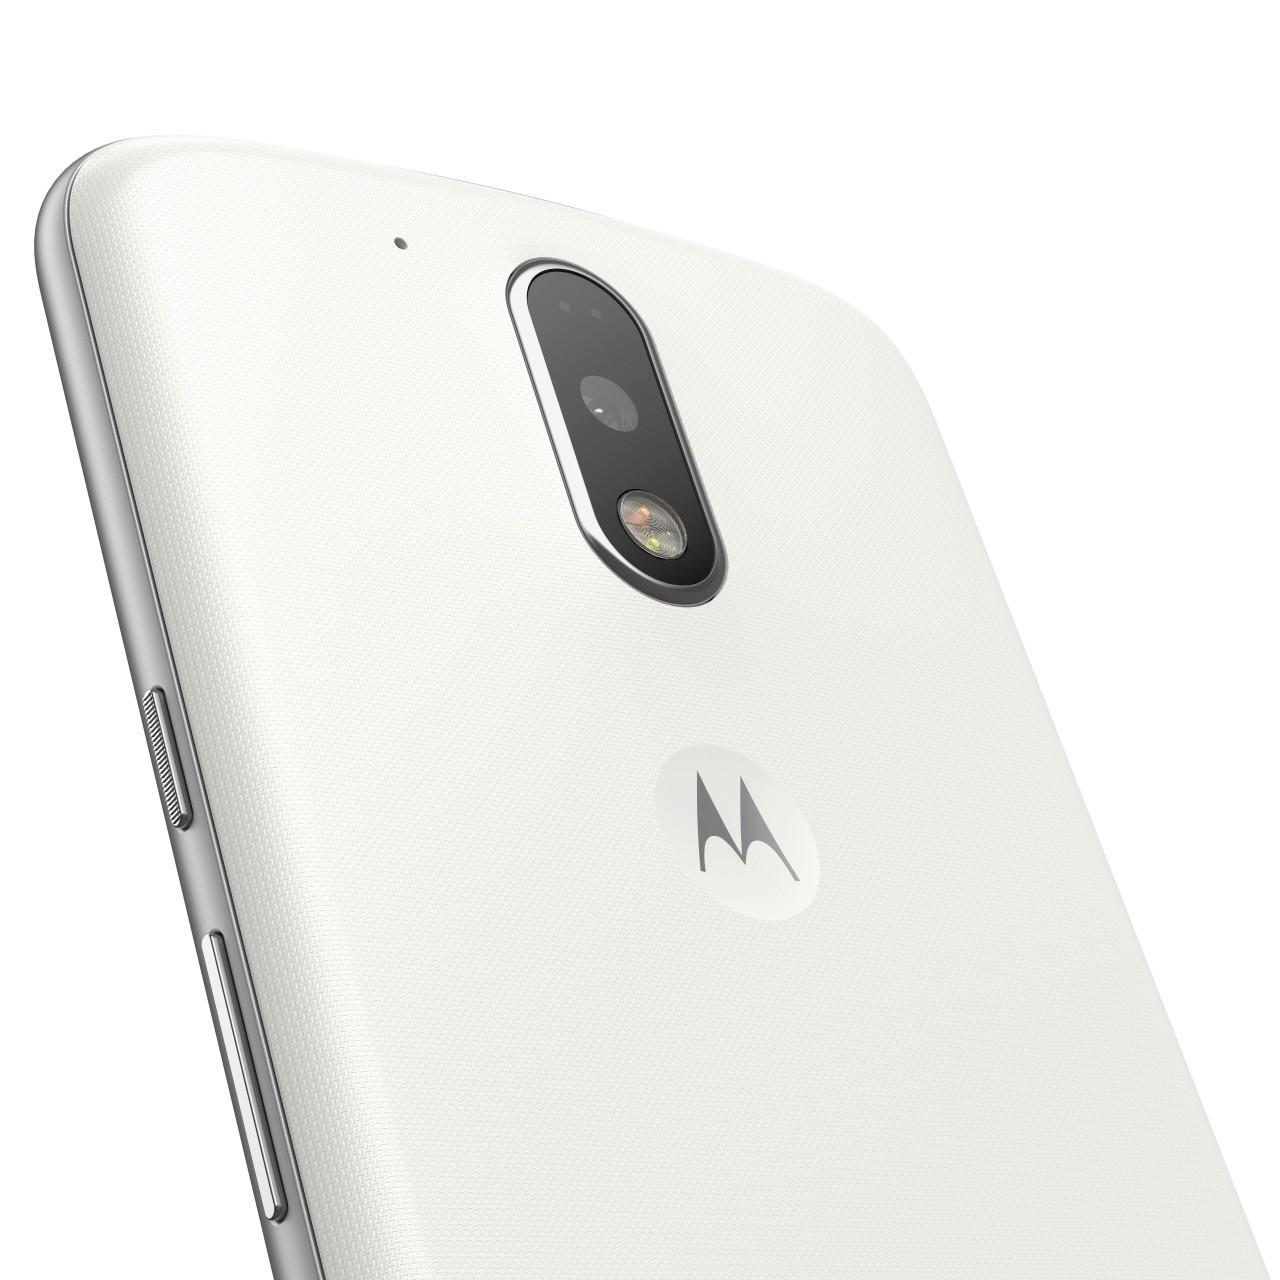 Lenovo MOTO G4 Plus Dual SIM White